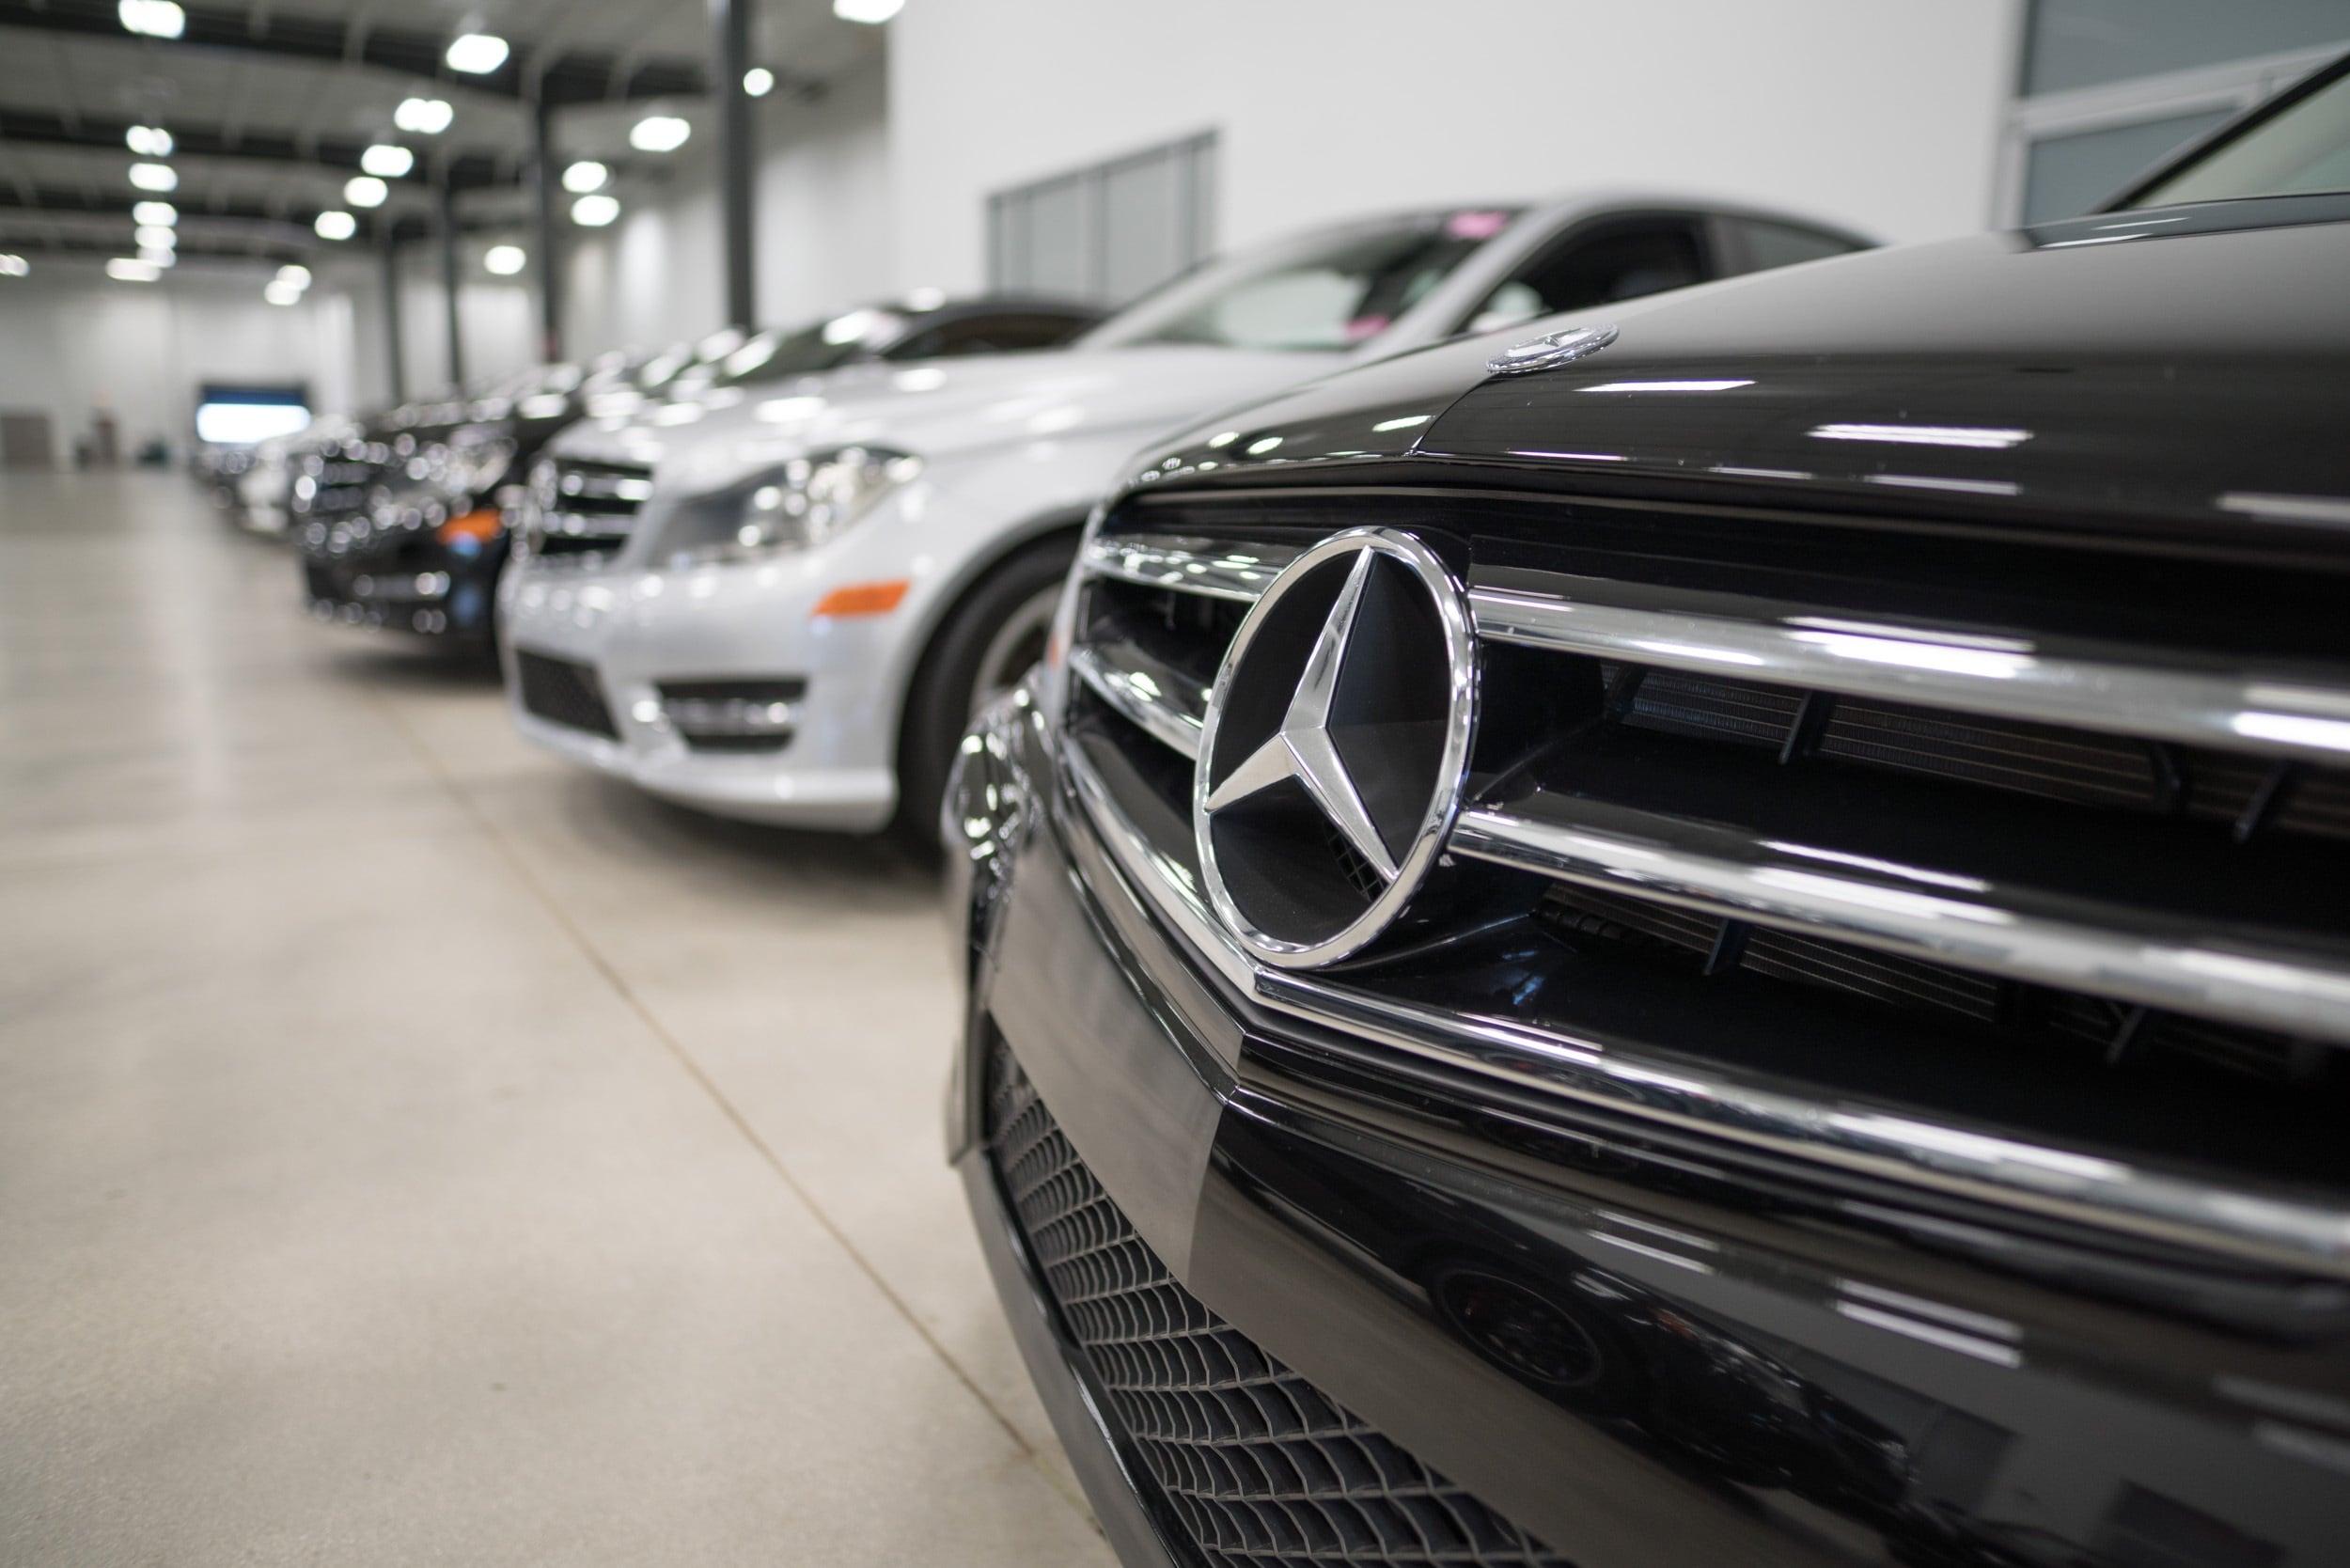 Mercedes Benz Dealer Near Me Sarasota Fl Mercedes Benz